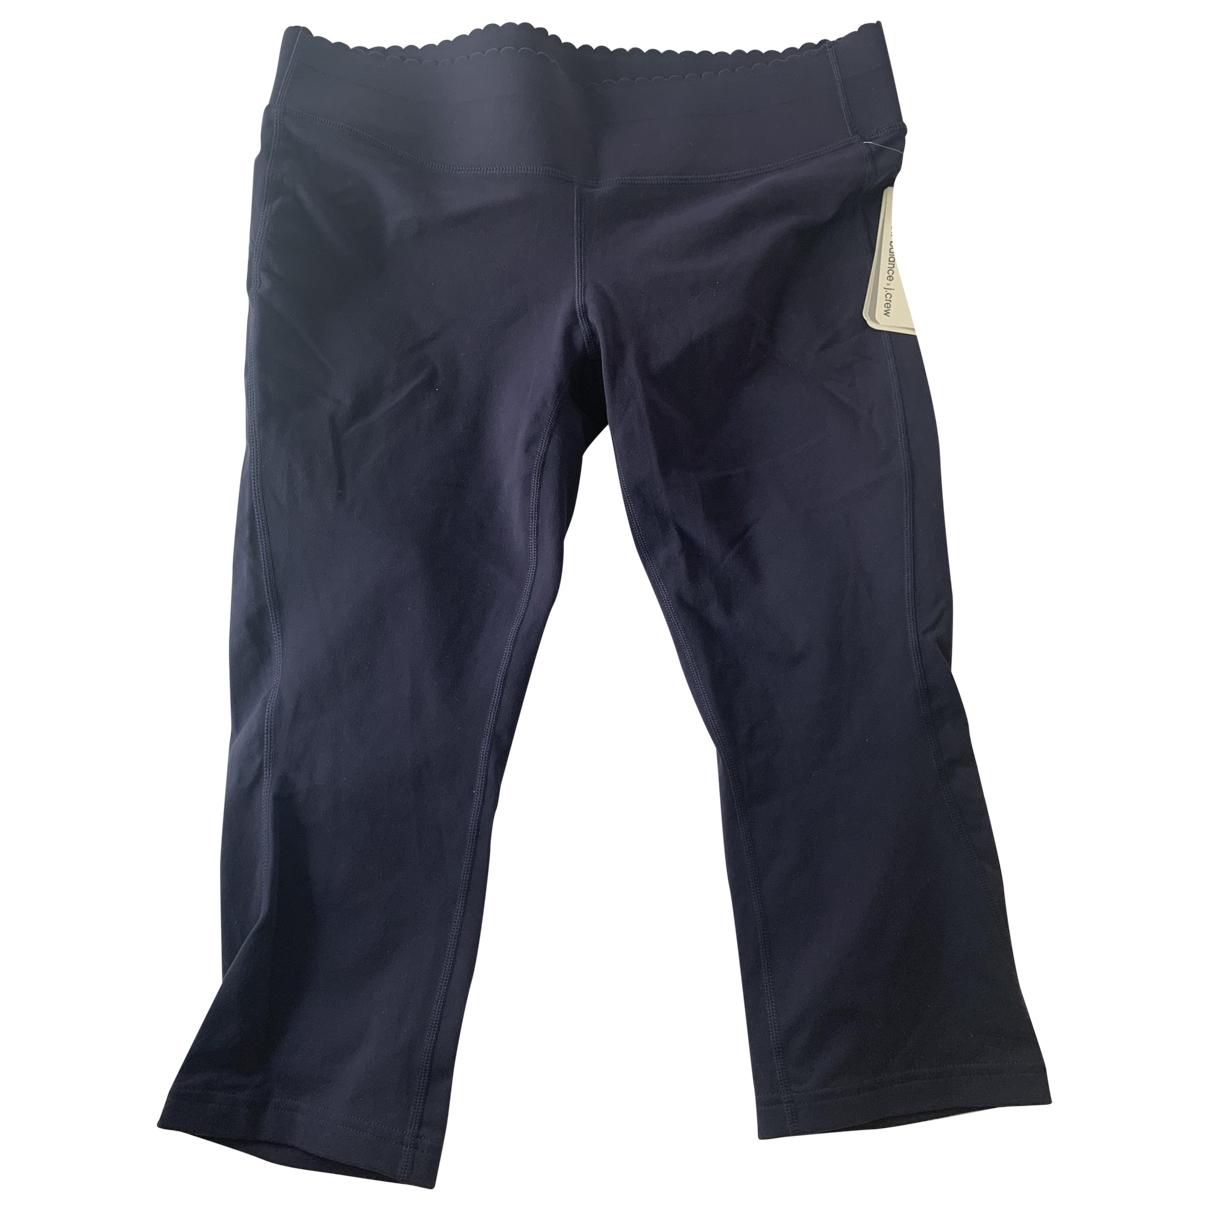 New Balance \N Navy Shorts for Women L International